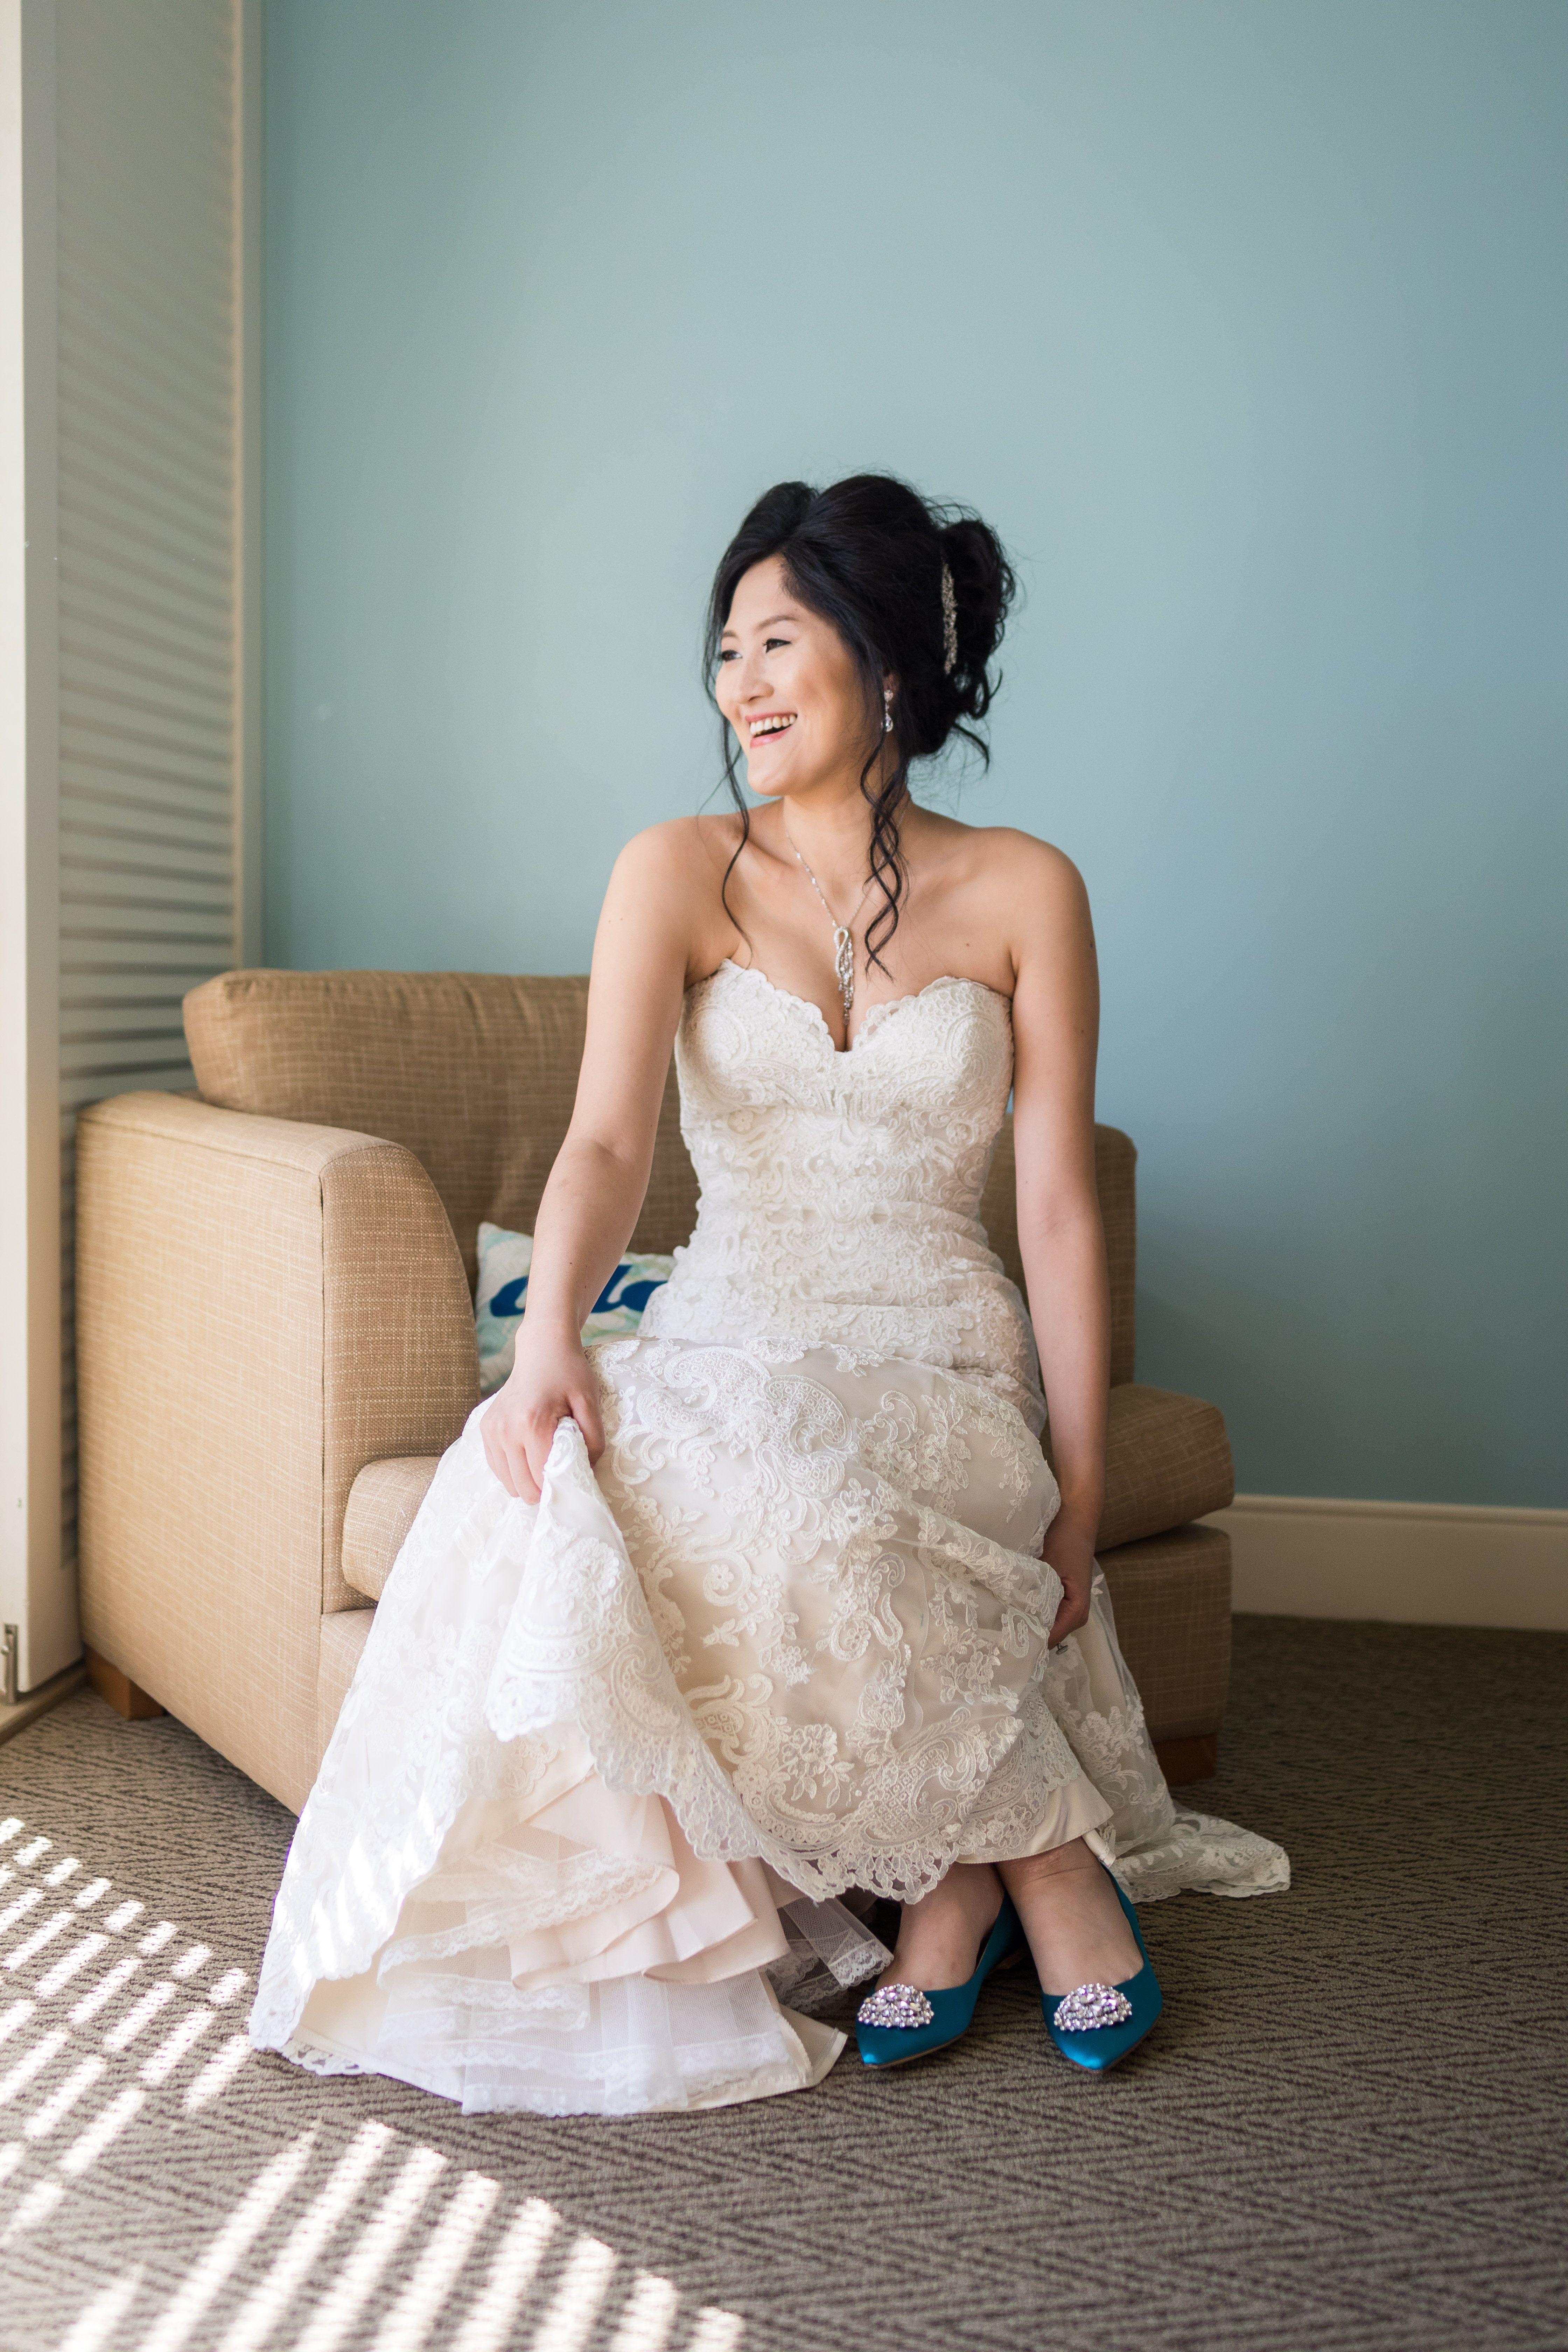 Stunning bridal portrait from wedding morning in hotel room. Bride ...